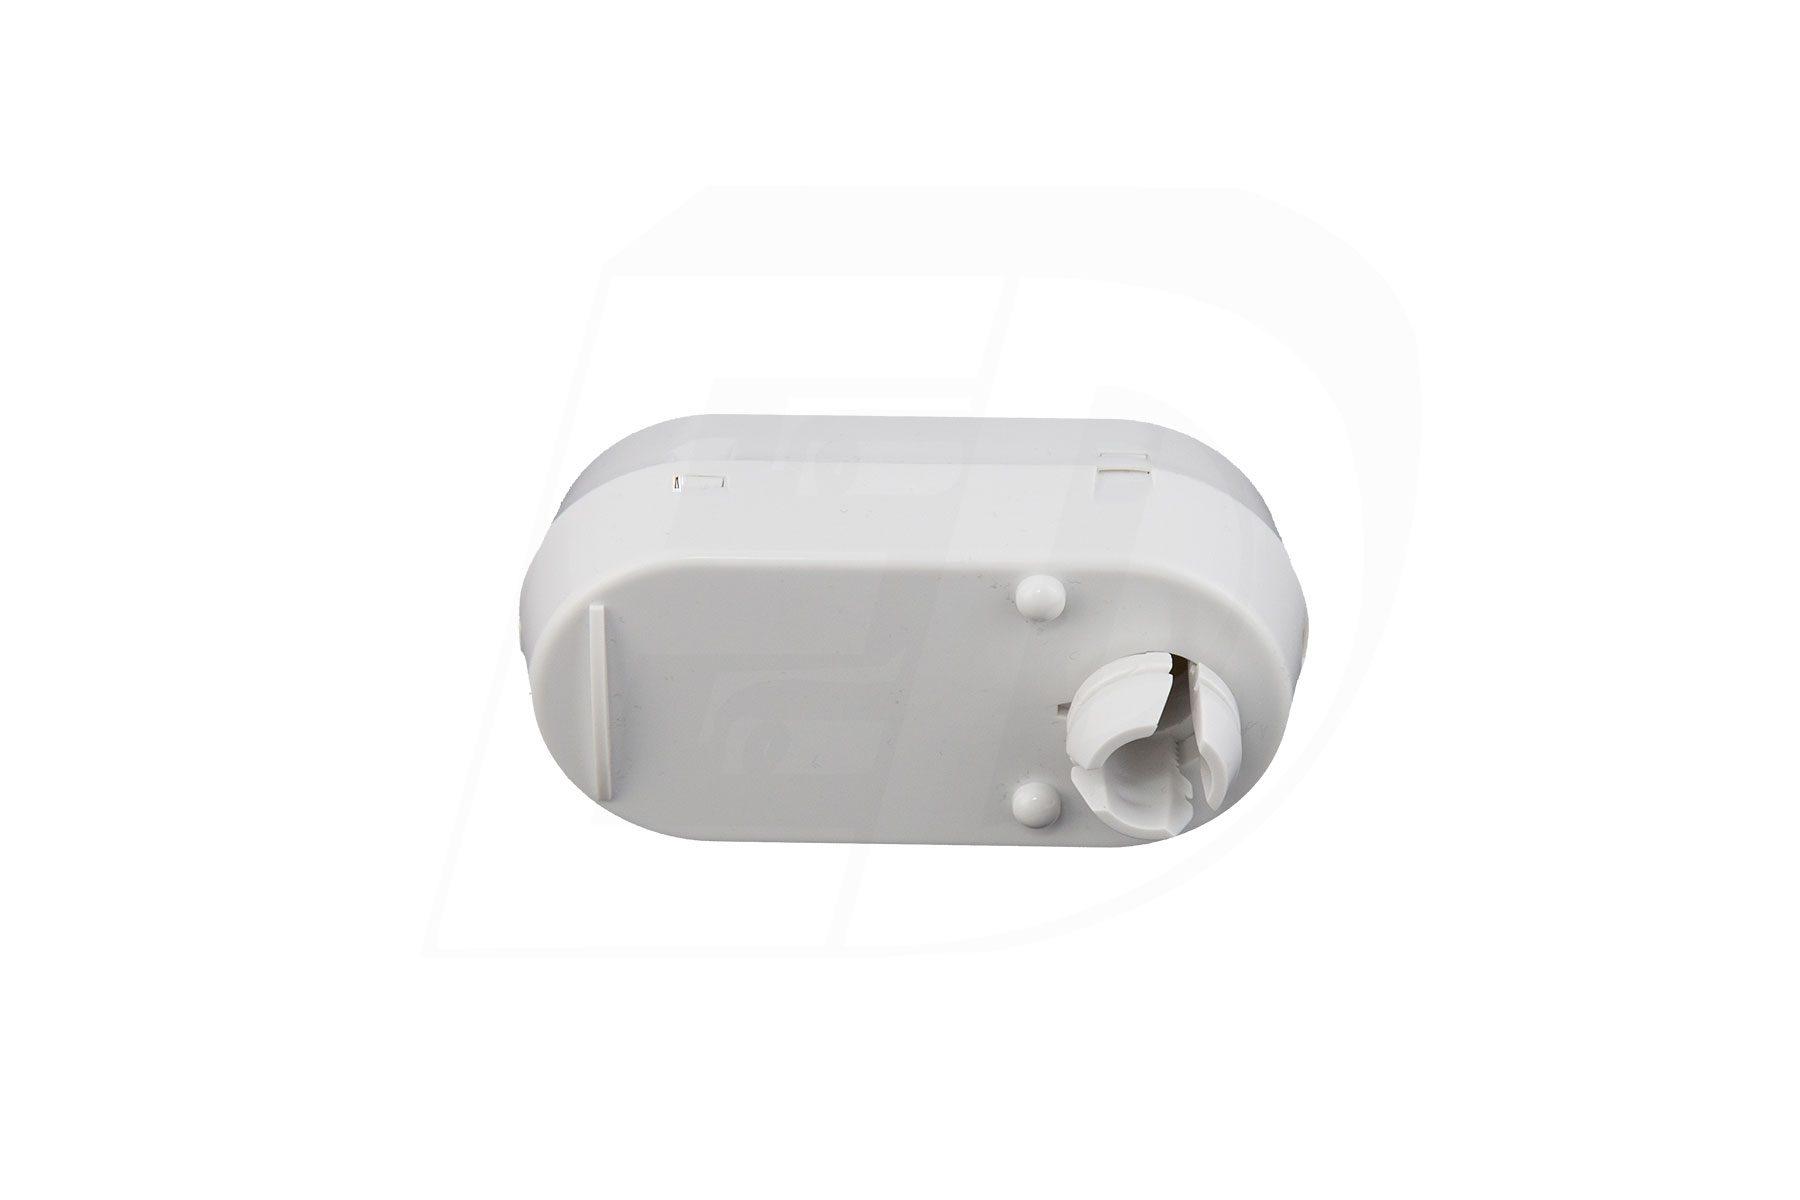 Short Bracket for SENPIR-HB-01 PIR High Bay Occupancy Sensor